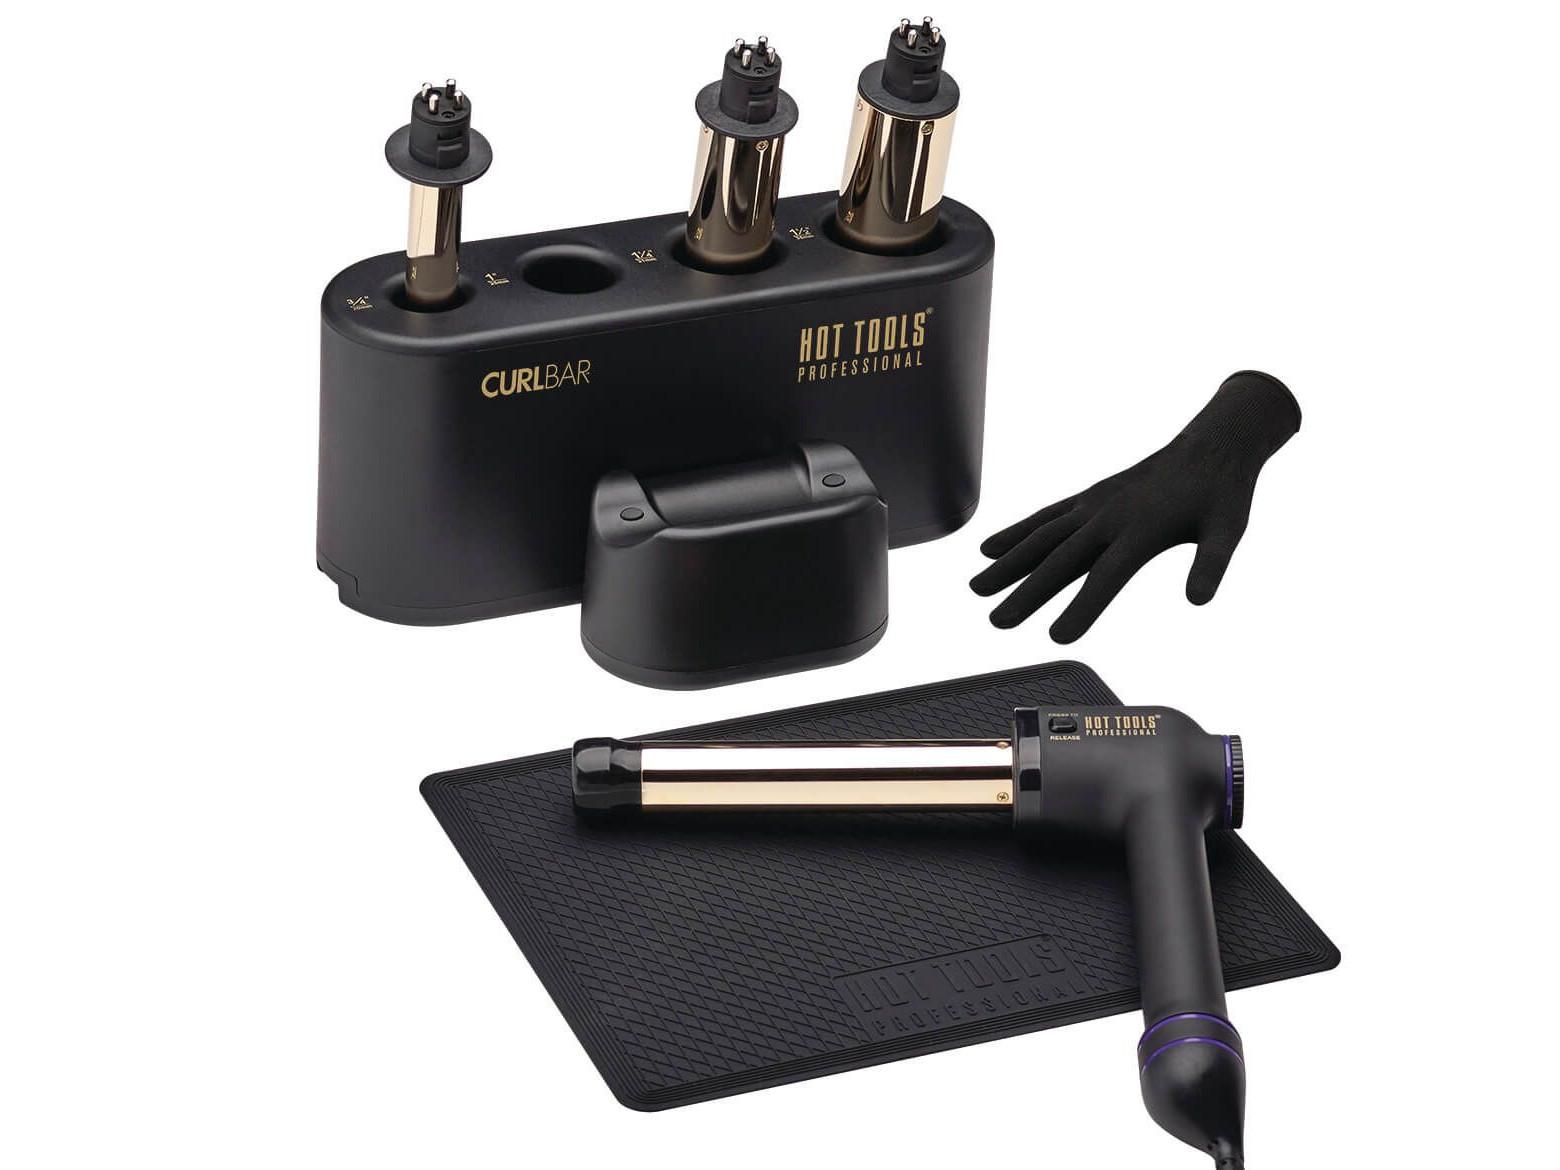 Kulma na vlasy Hot Tools 24K Gold Curl Bar Set - 19 mm, 25 mm, 32 mm, 38 mm (HTCURLSETUK) + DÁREK ZDARMA